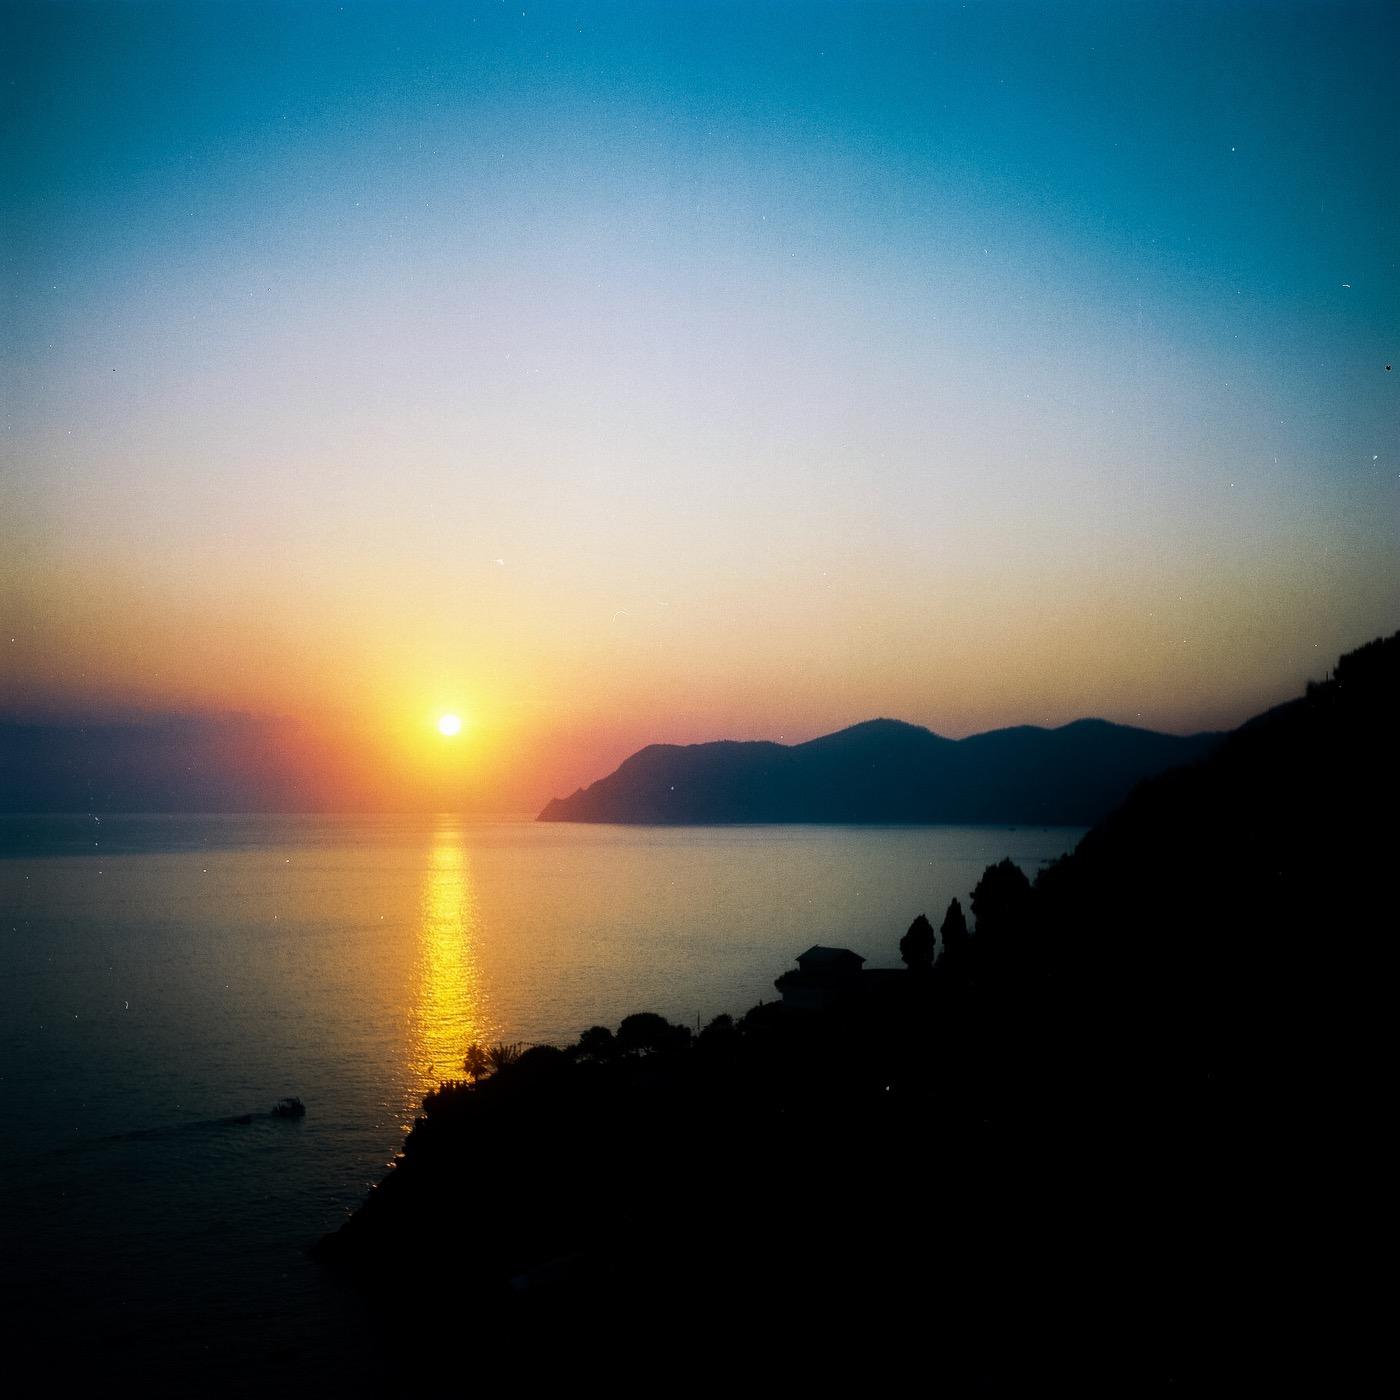 Manarola sunset - 6x6 film